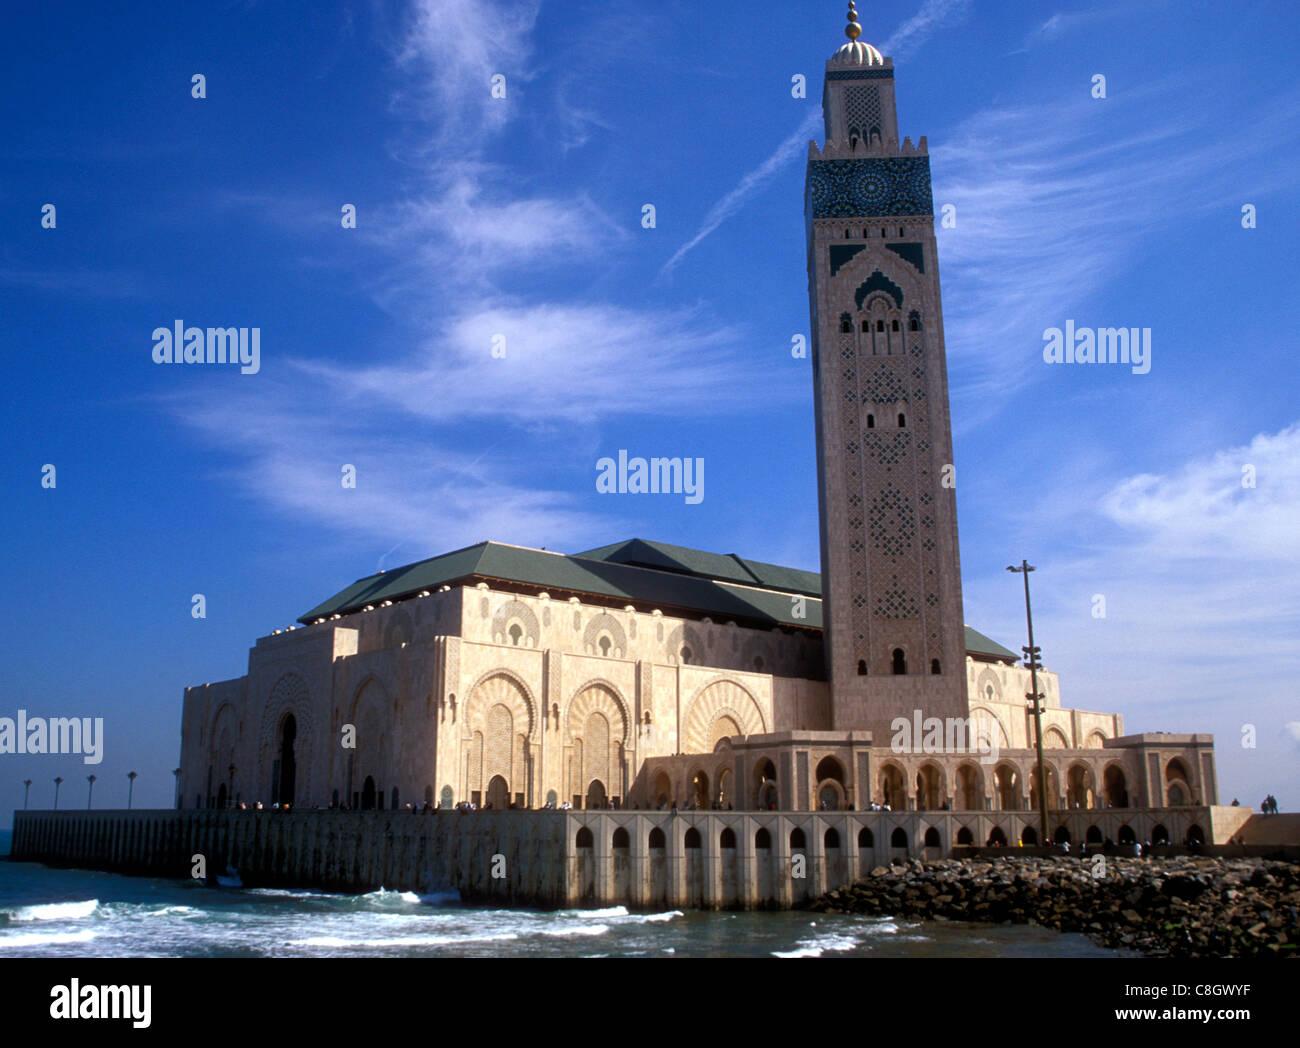 Hassan II Mosque in Casablanca Morocco - Stock Image